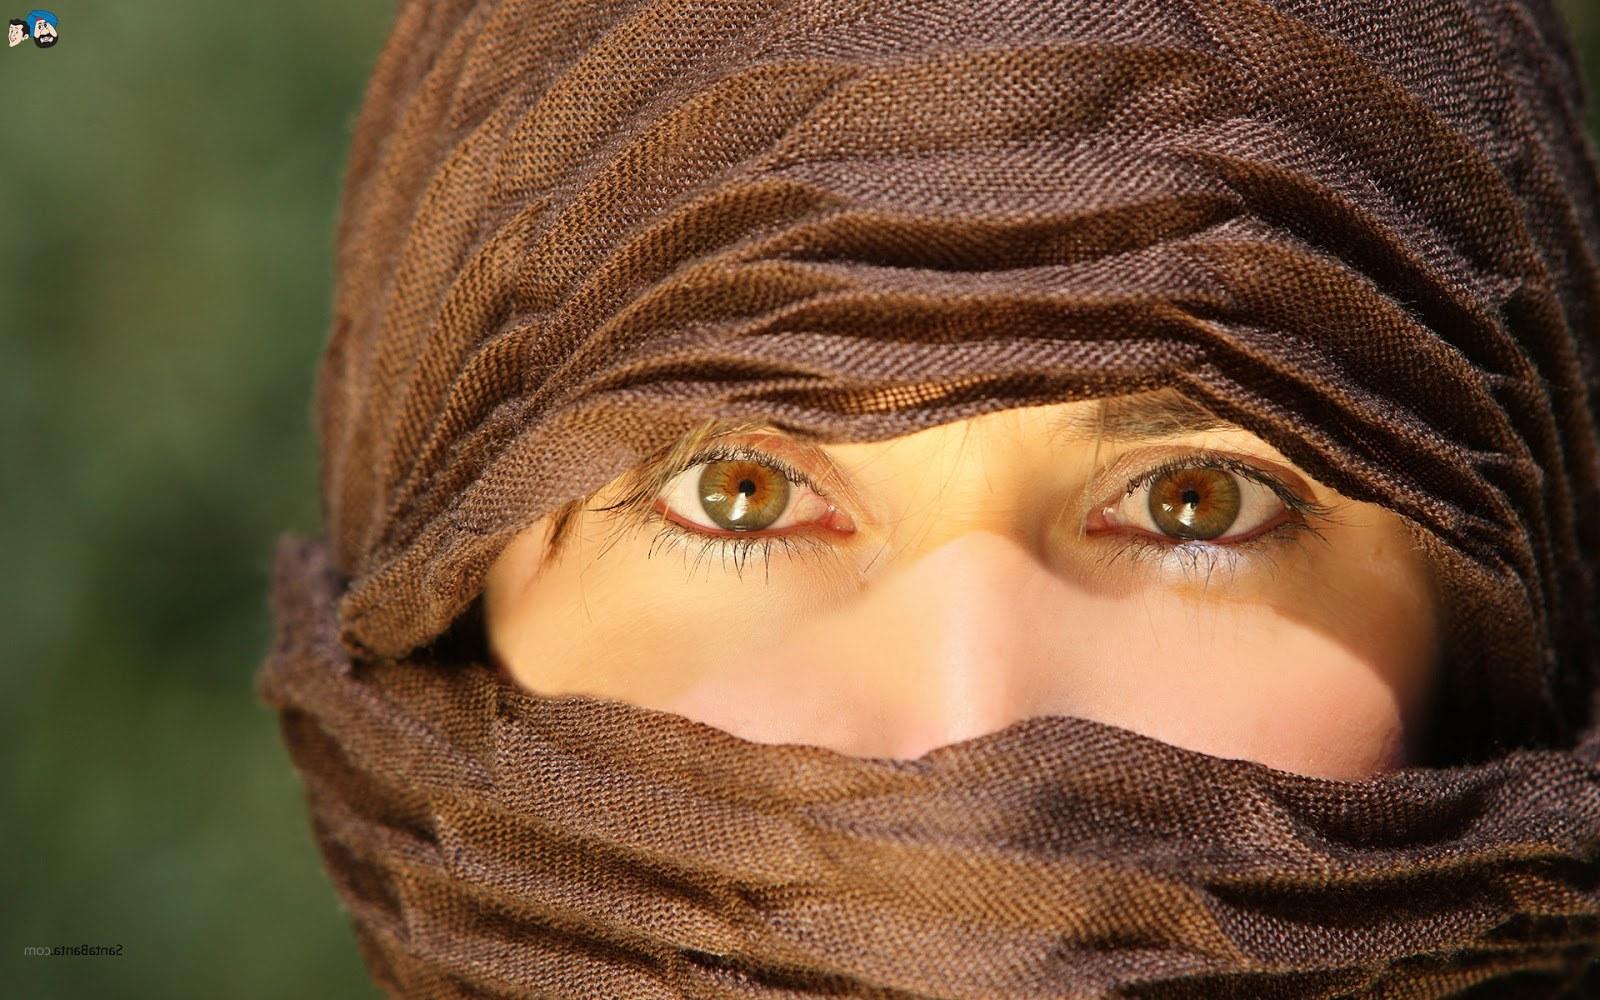 Ide Muslimah Bercadar E9dx Koleksi Wallpaper Wanita Muslimah Bercadar